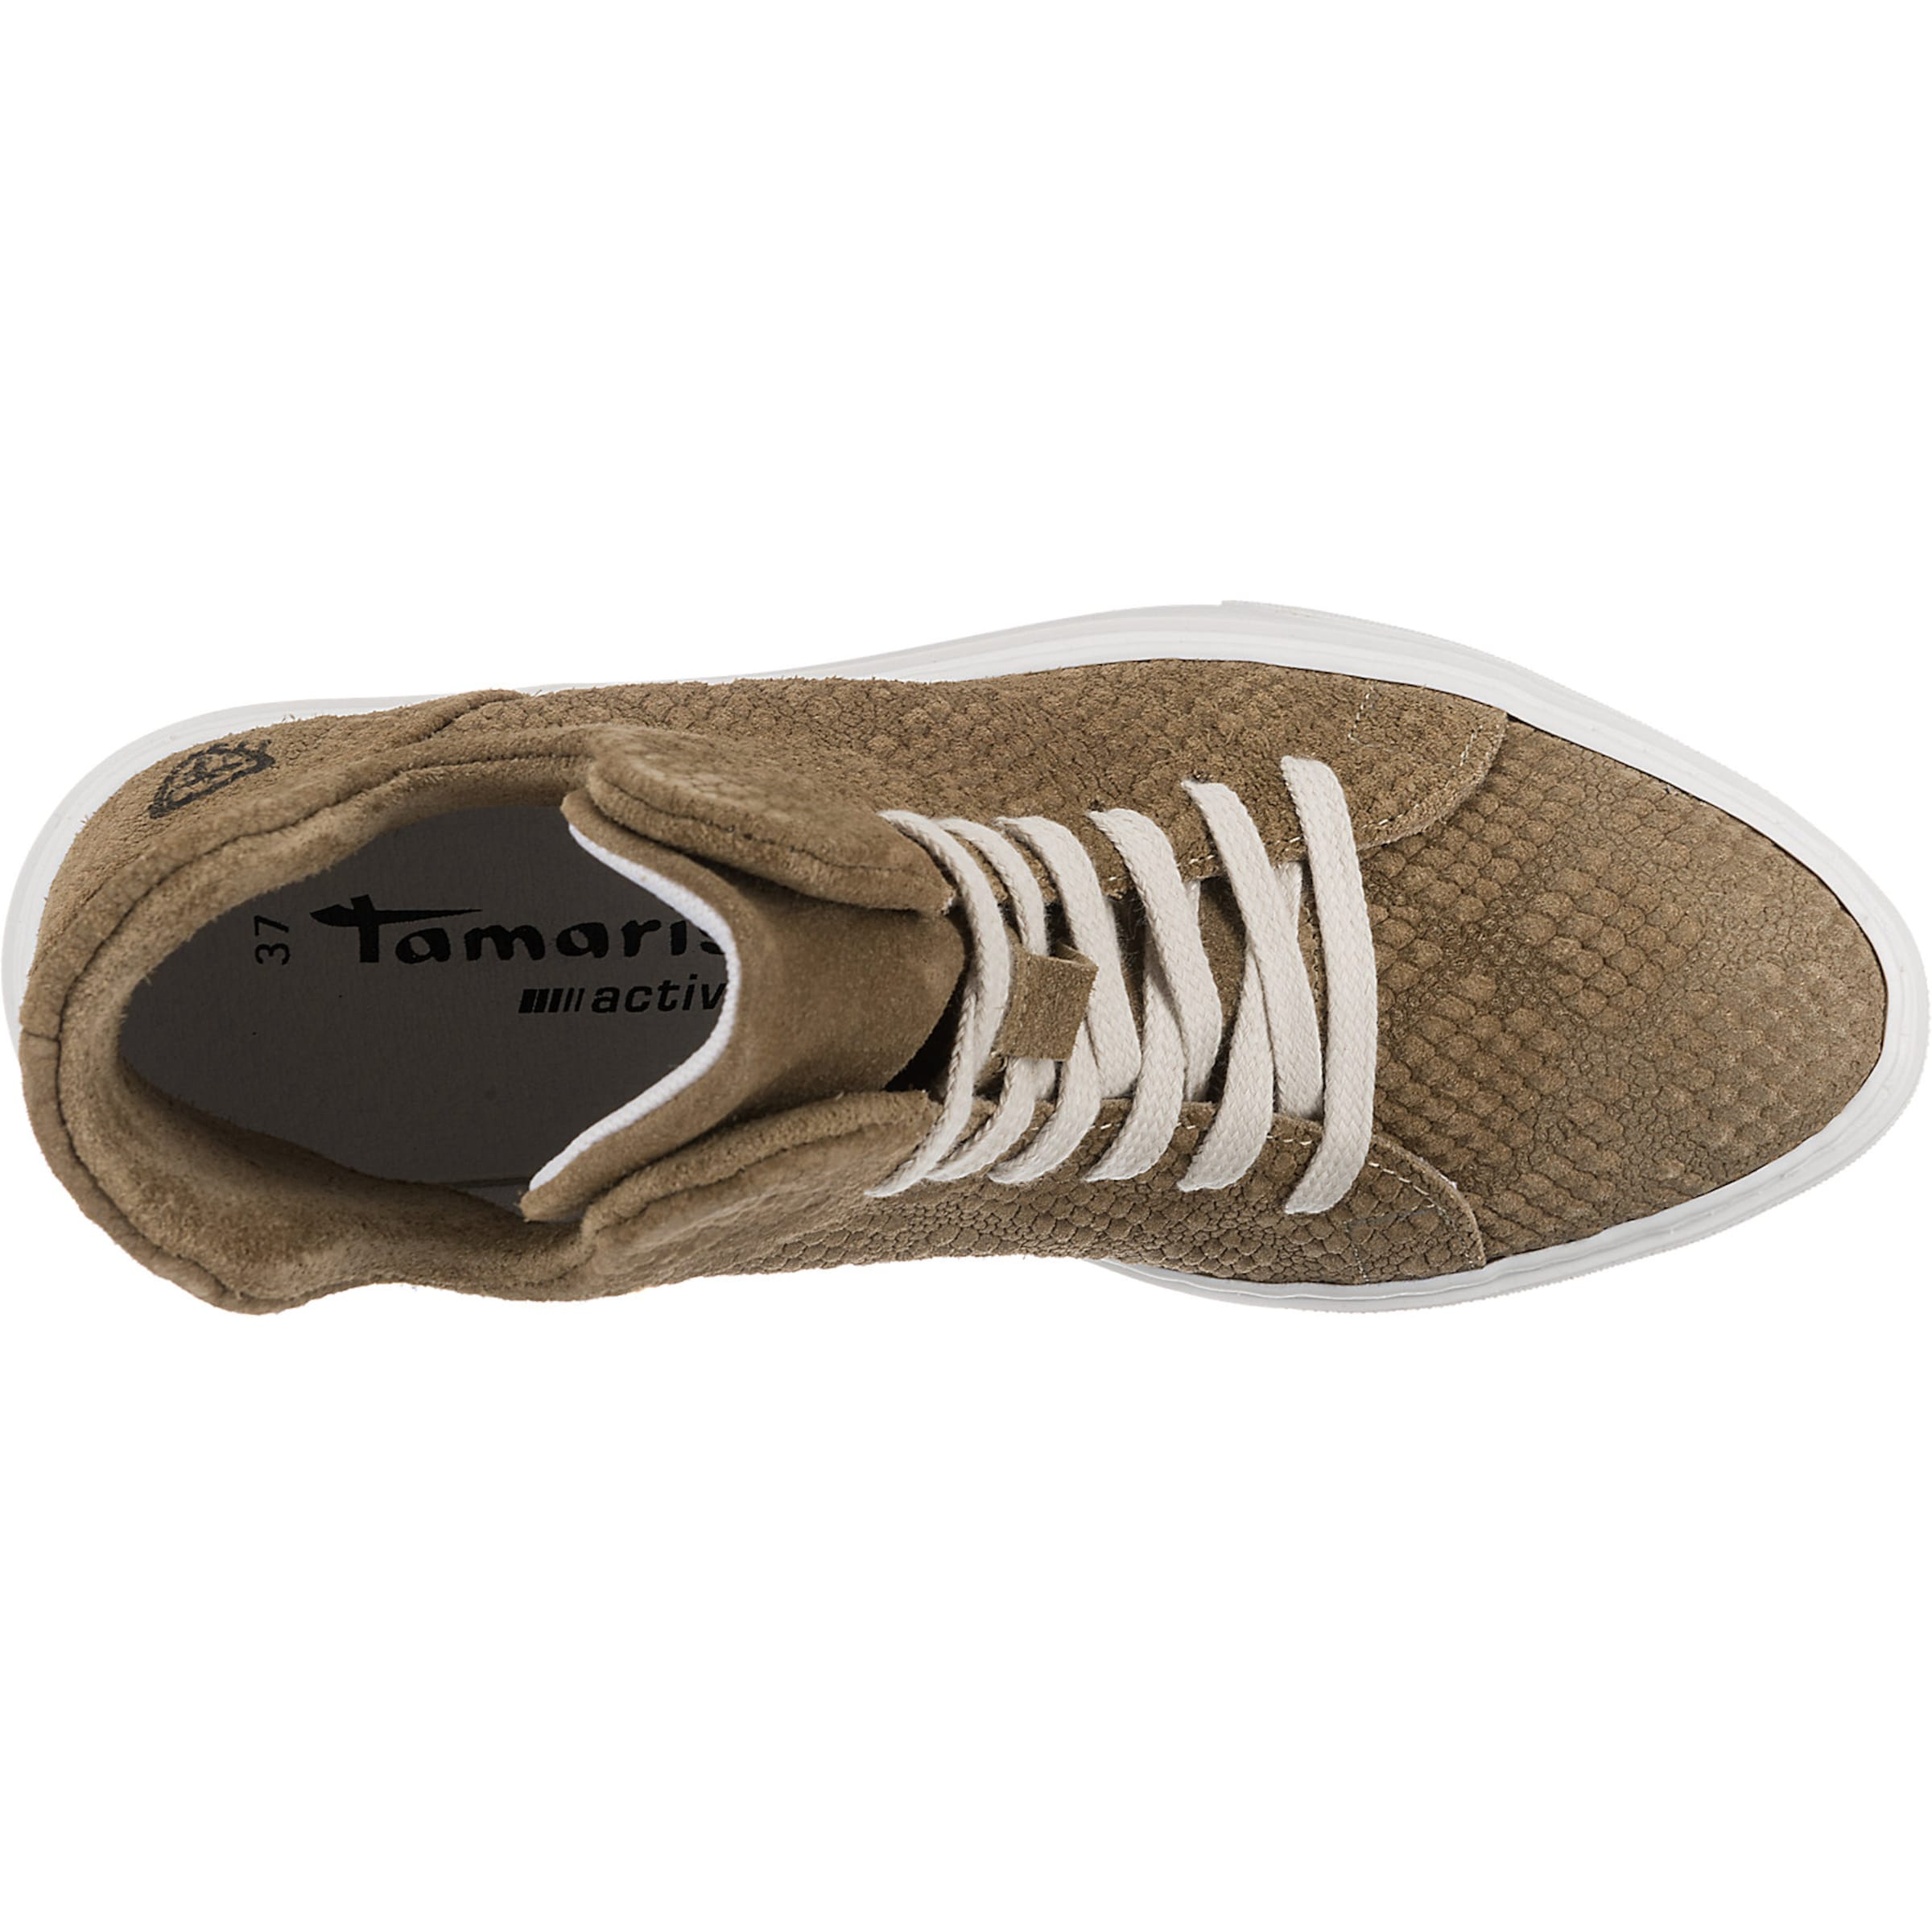 In Sneaker Tamaris Carlota Sneaker Dunkelbeige Carlota Tamaris In Dunkelbeige Tamaris 2DHWE9IY